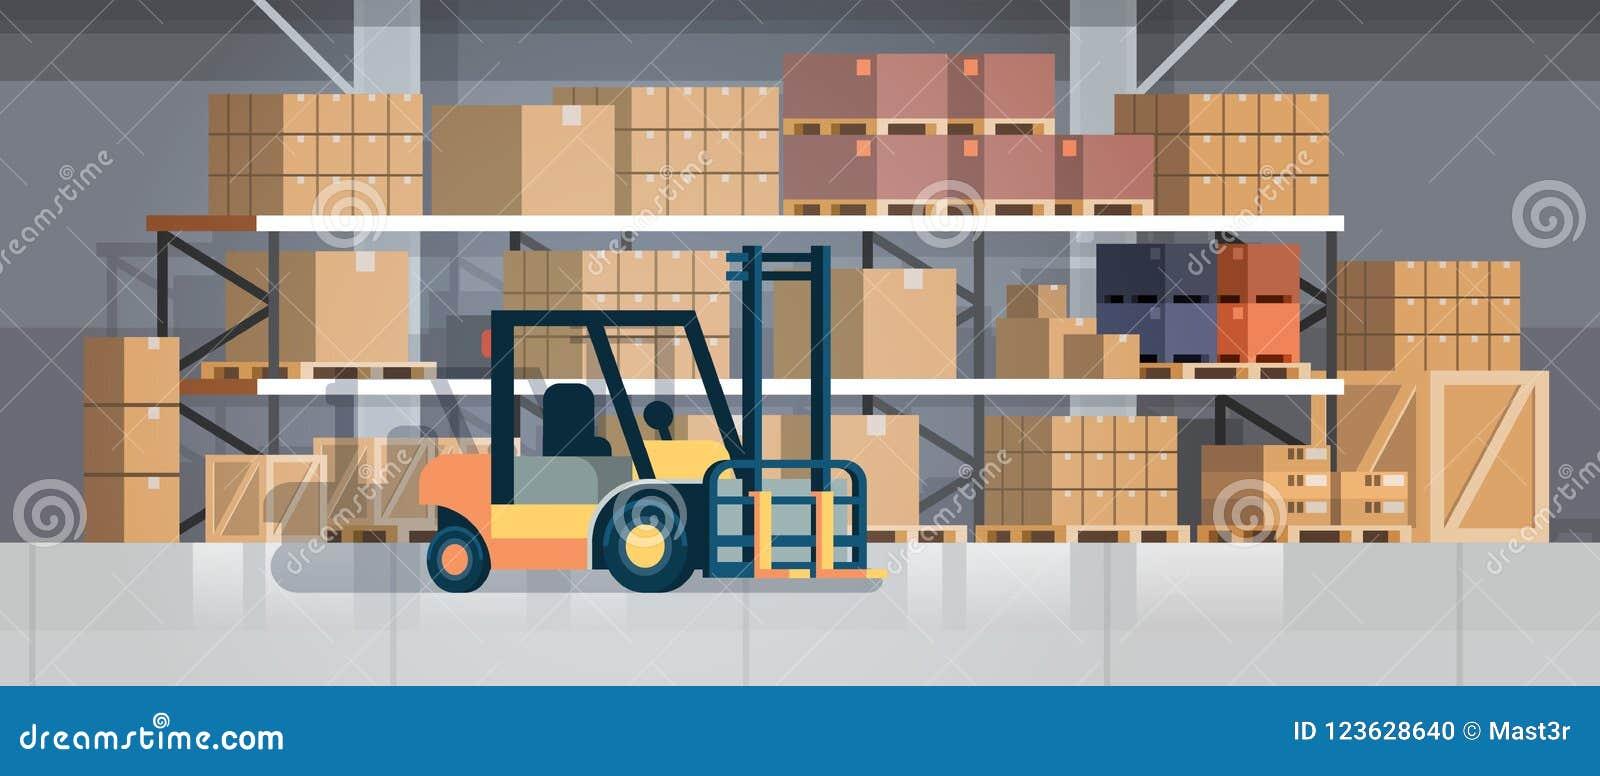 Коробки шкафа предпосылки склада оборудования тележки штабелеукладчика паллета затяжелителя грузоподъемника концепция поставки вн